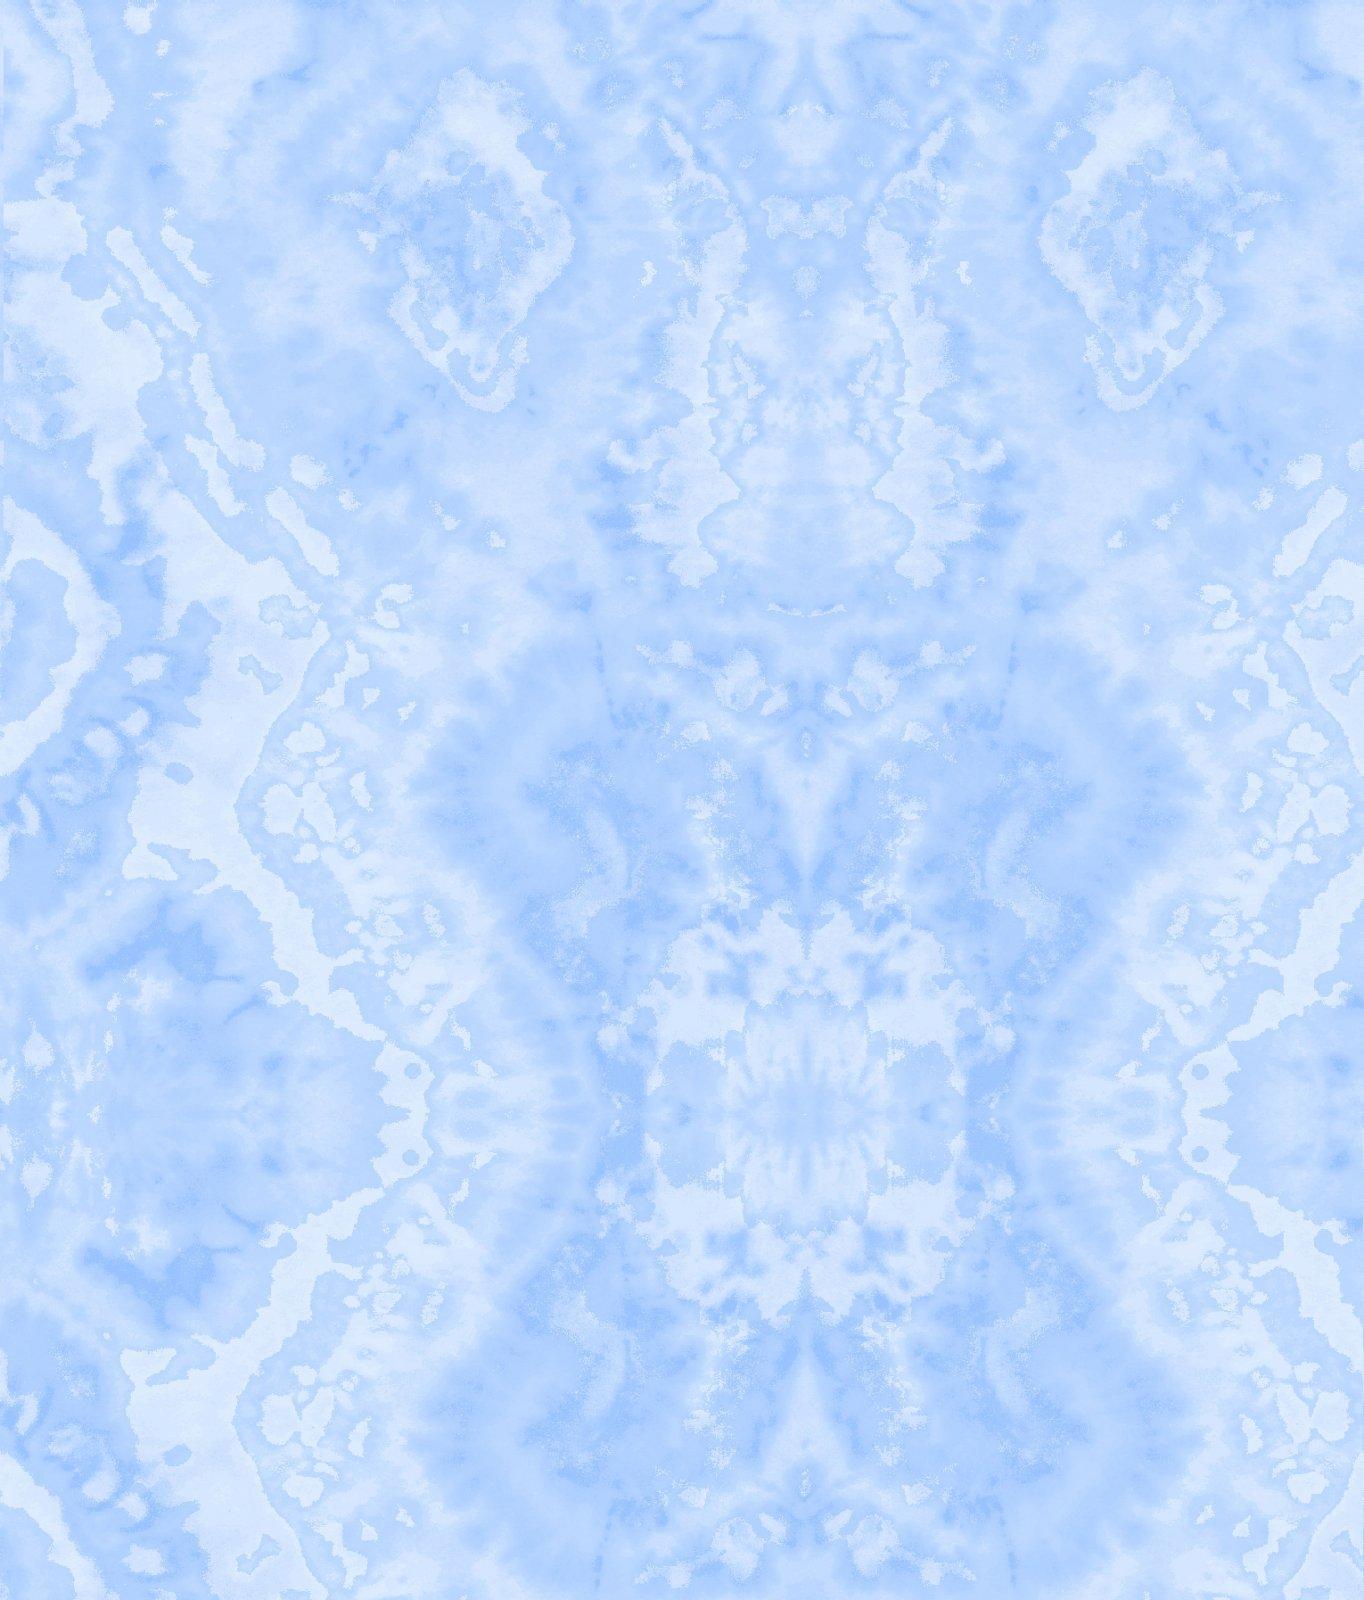 Comfy Flannel Print Medium Blue Blender